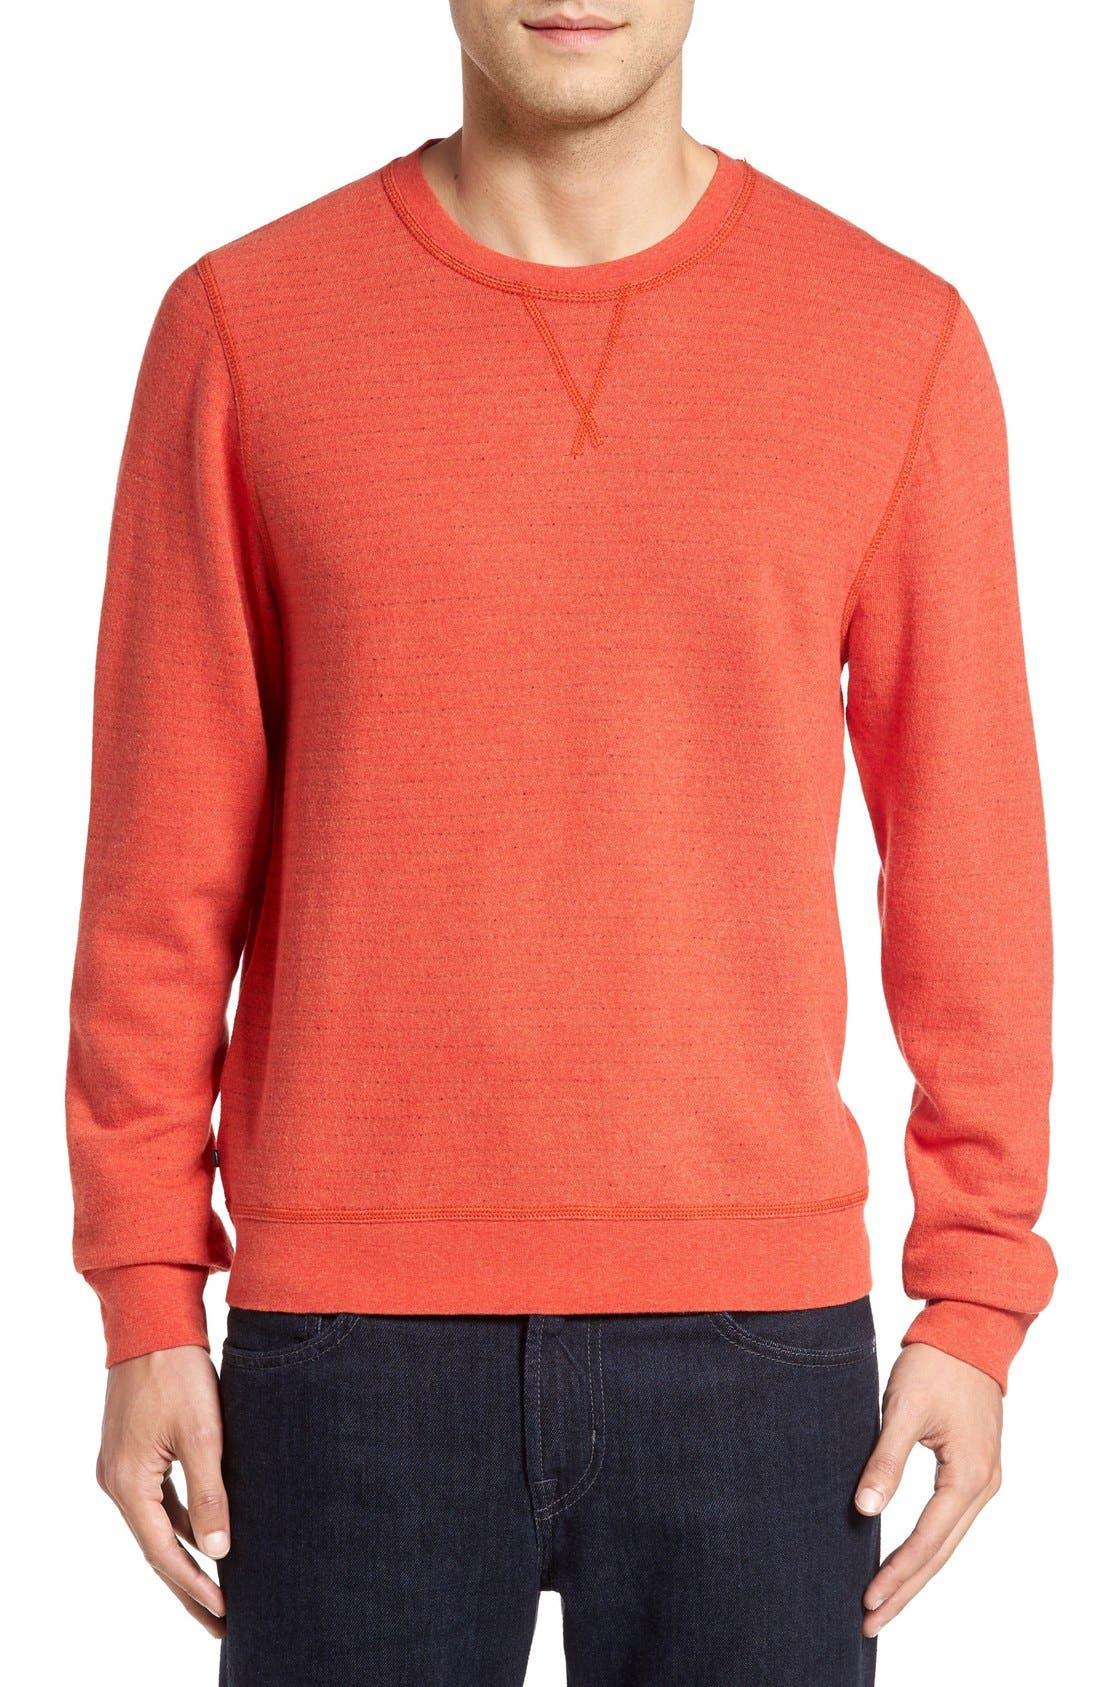 Cutter & Buck 'Gleann' French Terry Crewneck Sweatshirt (Big & Tall)